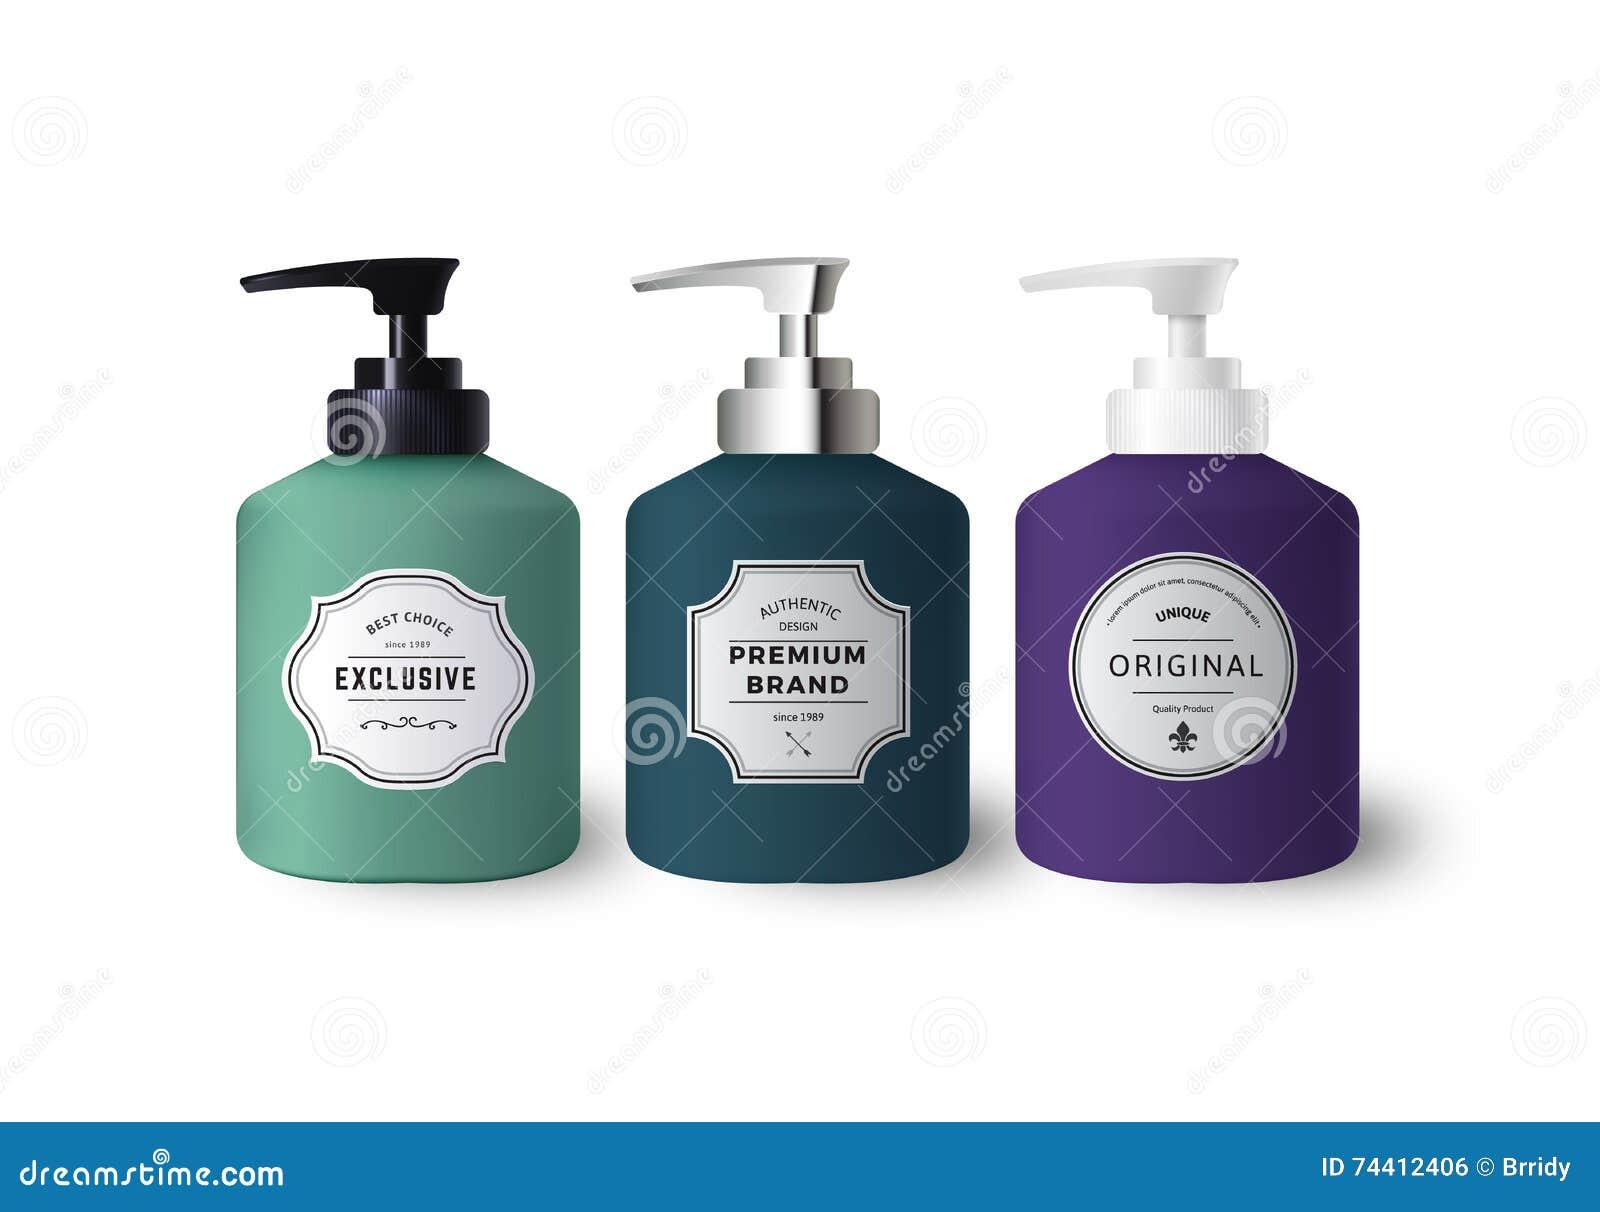 Realistic Colorful Liquid Soap Dispensers Stock Vector Illustration Of Liquid Design 74412406